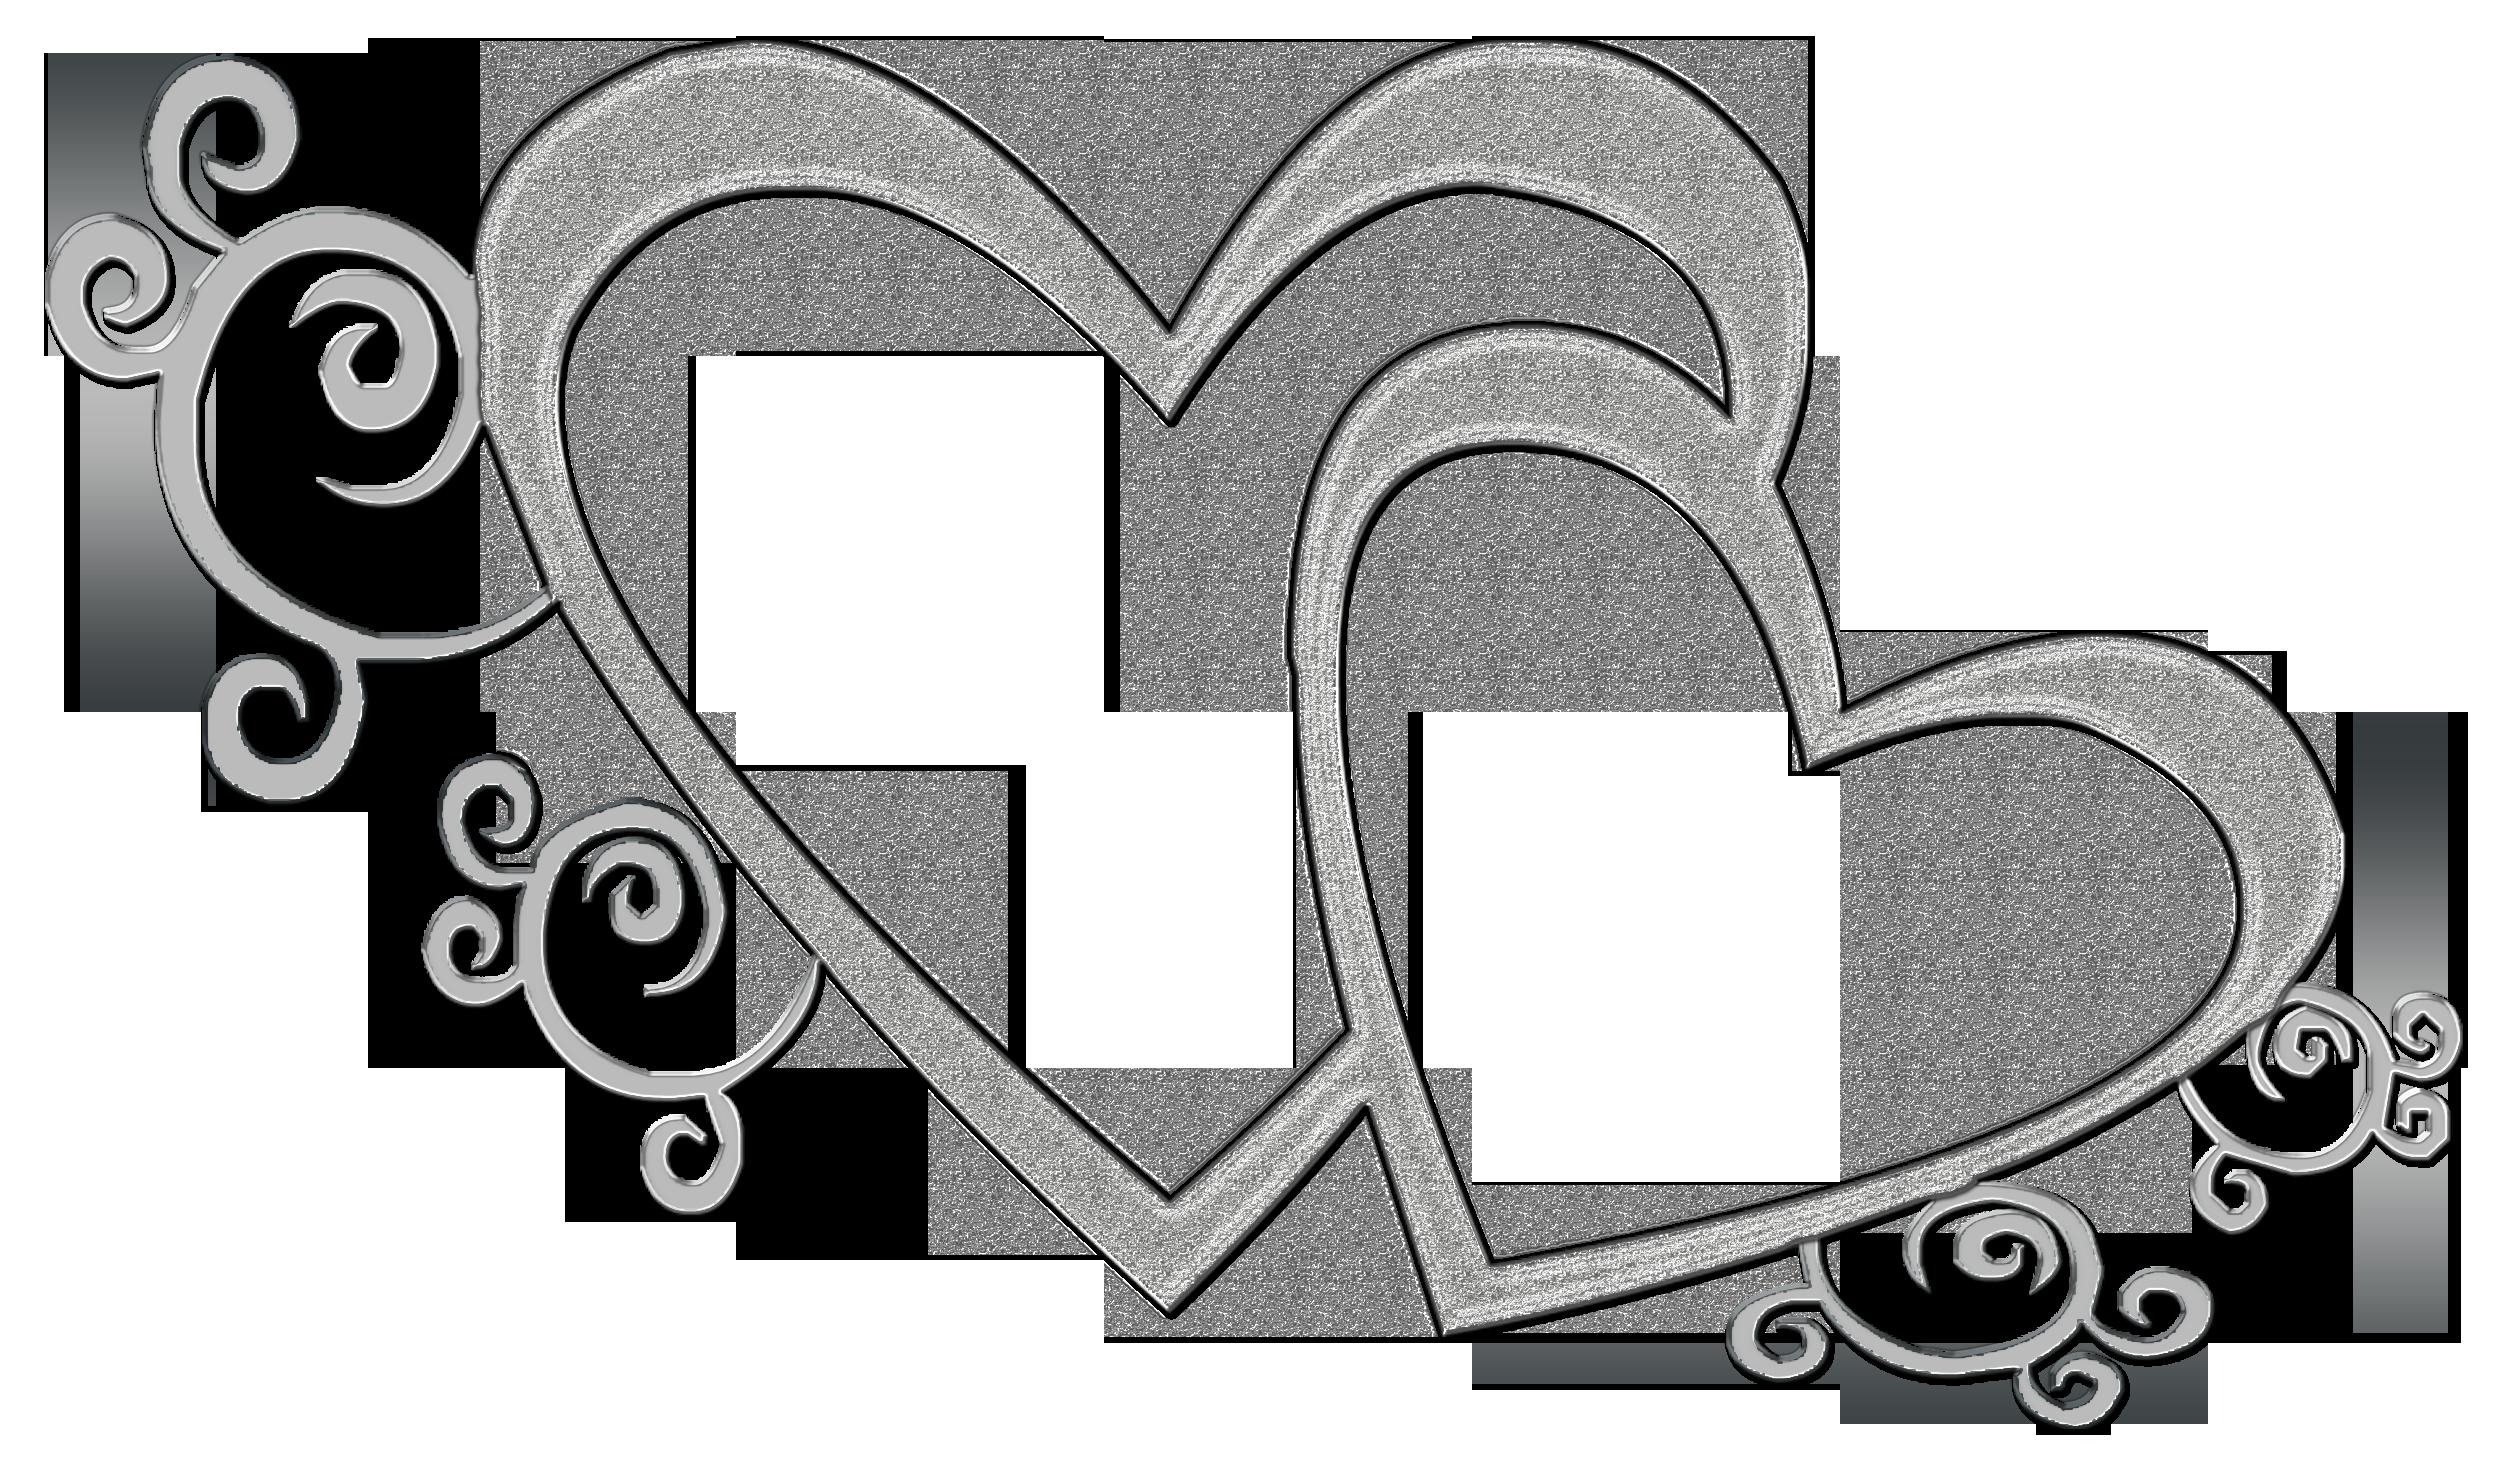 Heart black and white double heart clipa-Heart black and white double heart clipart black and white-15